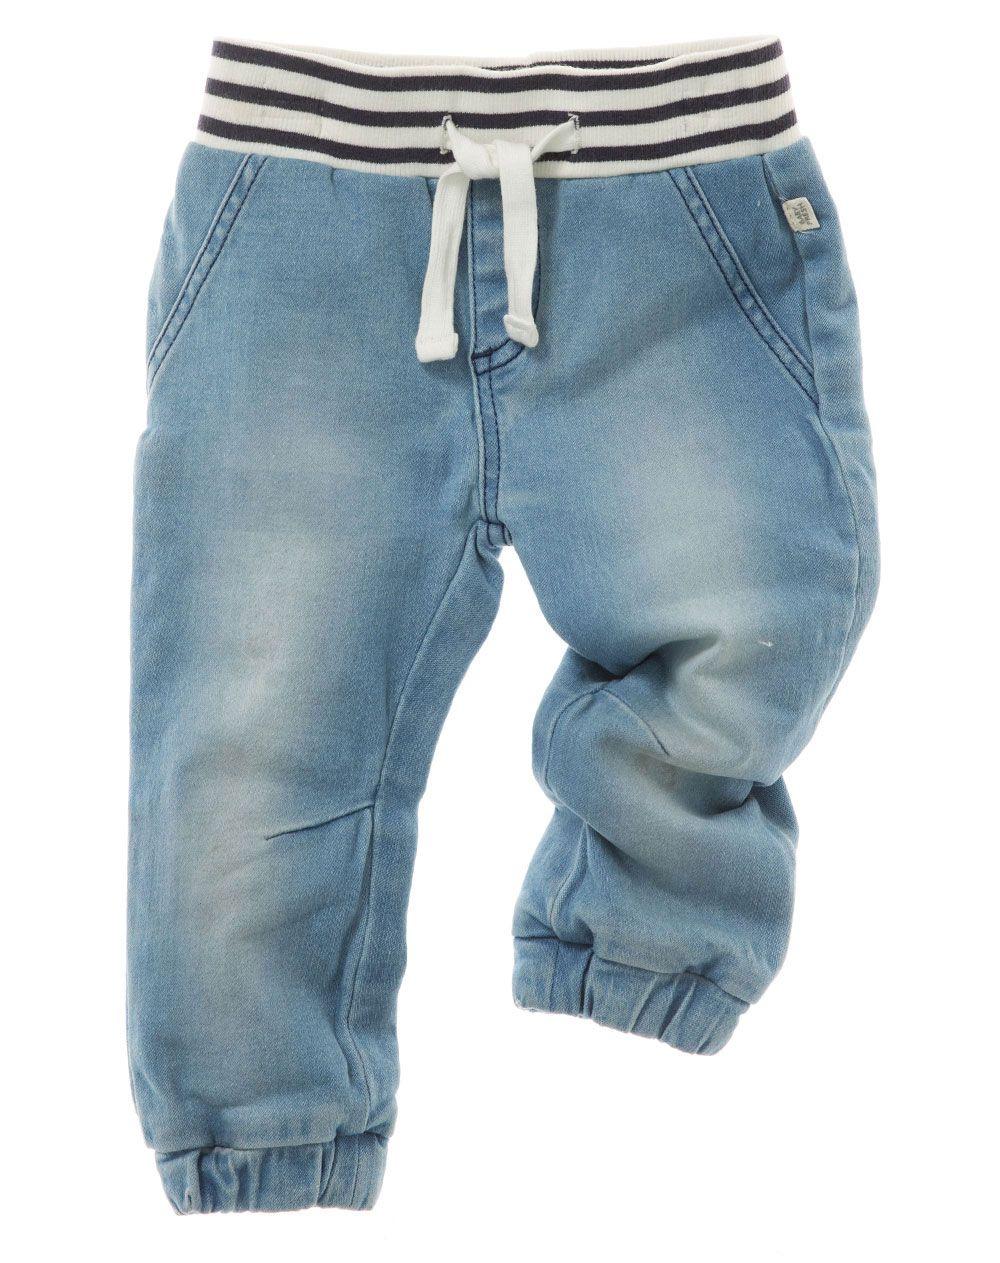 LAPLBEKE Boys Jeans Elasticated Adjustable Waist Trousers Blue Wash Denim Pants Children Kids Spring Autumn Winter